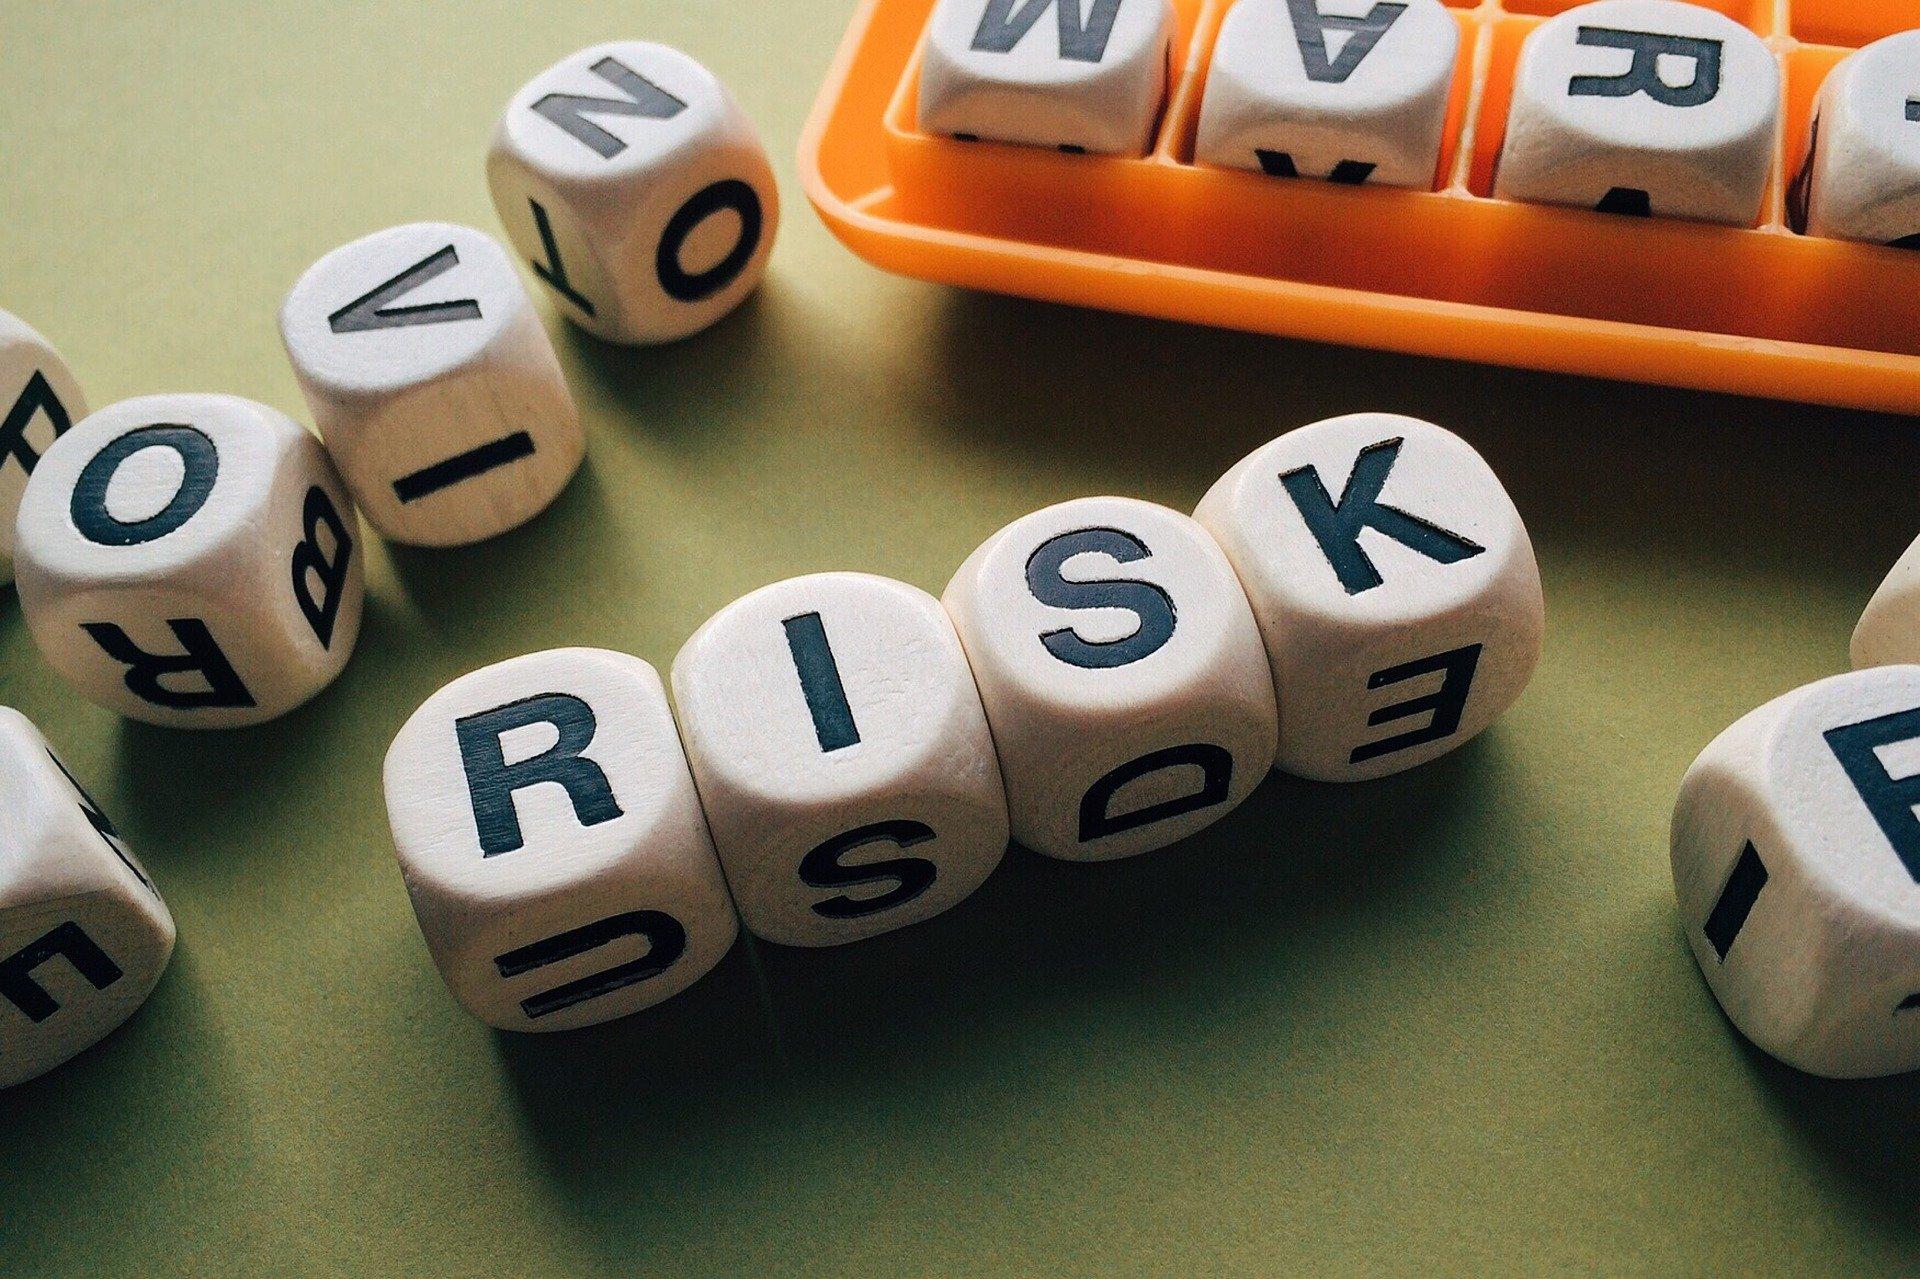 Lowering manufacturing risks